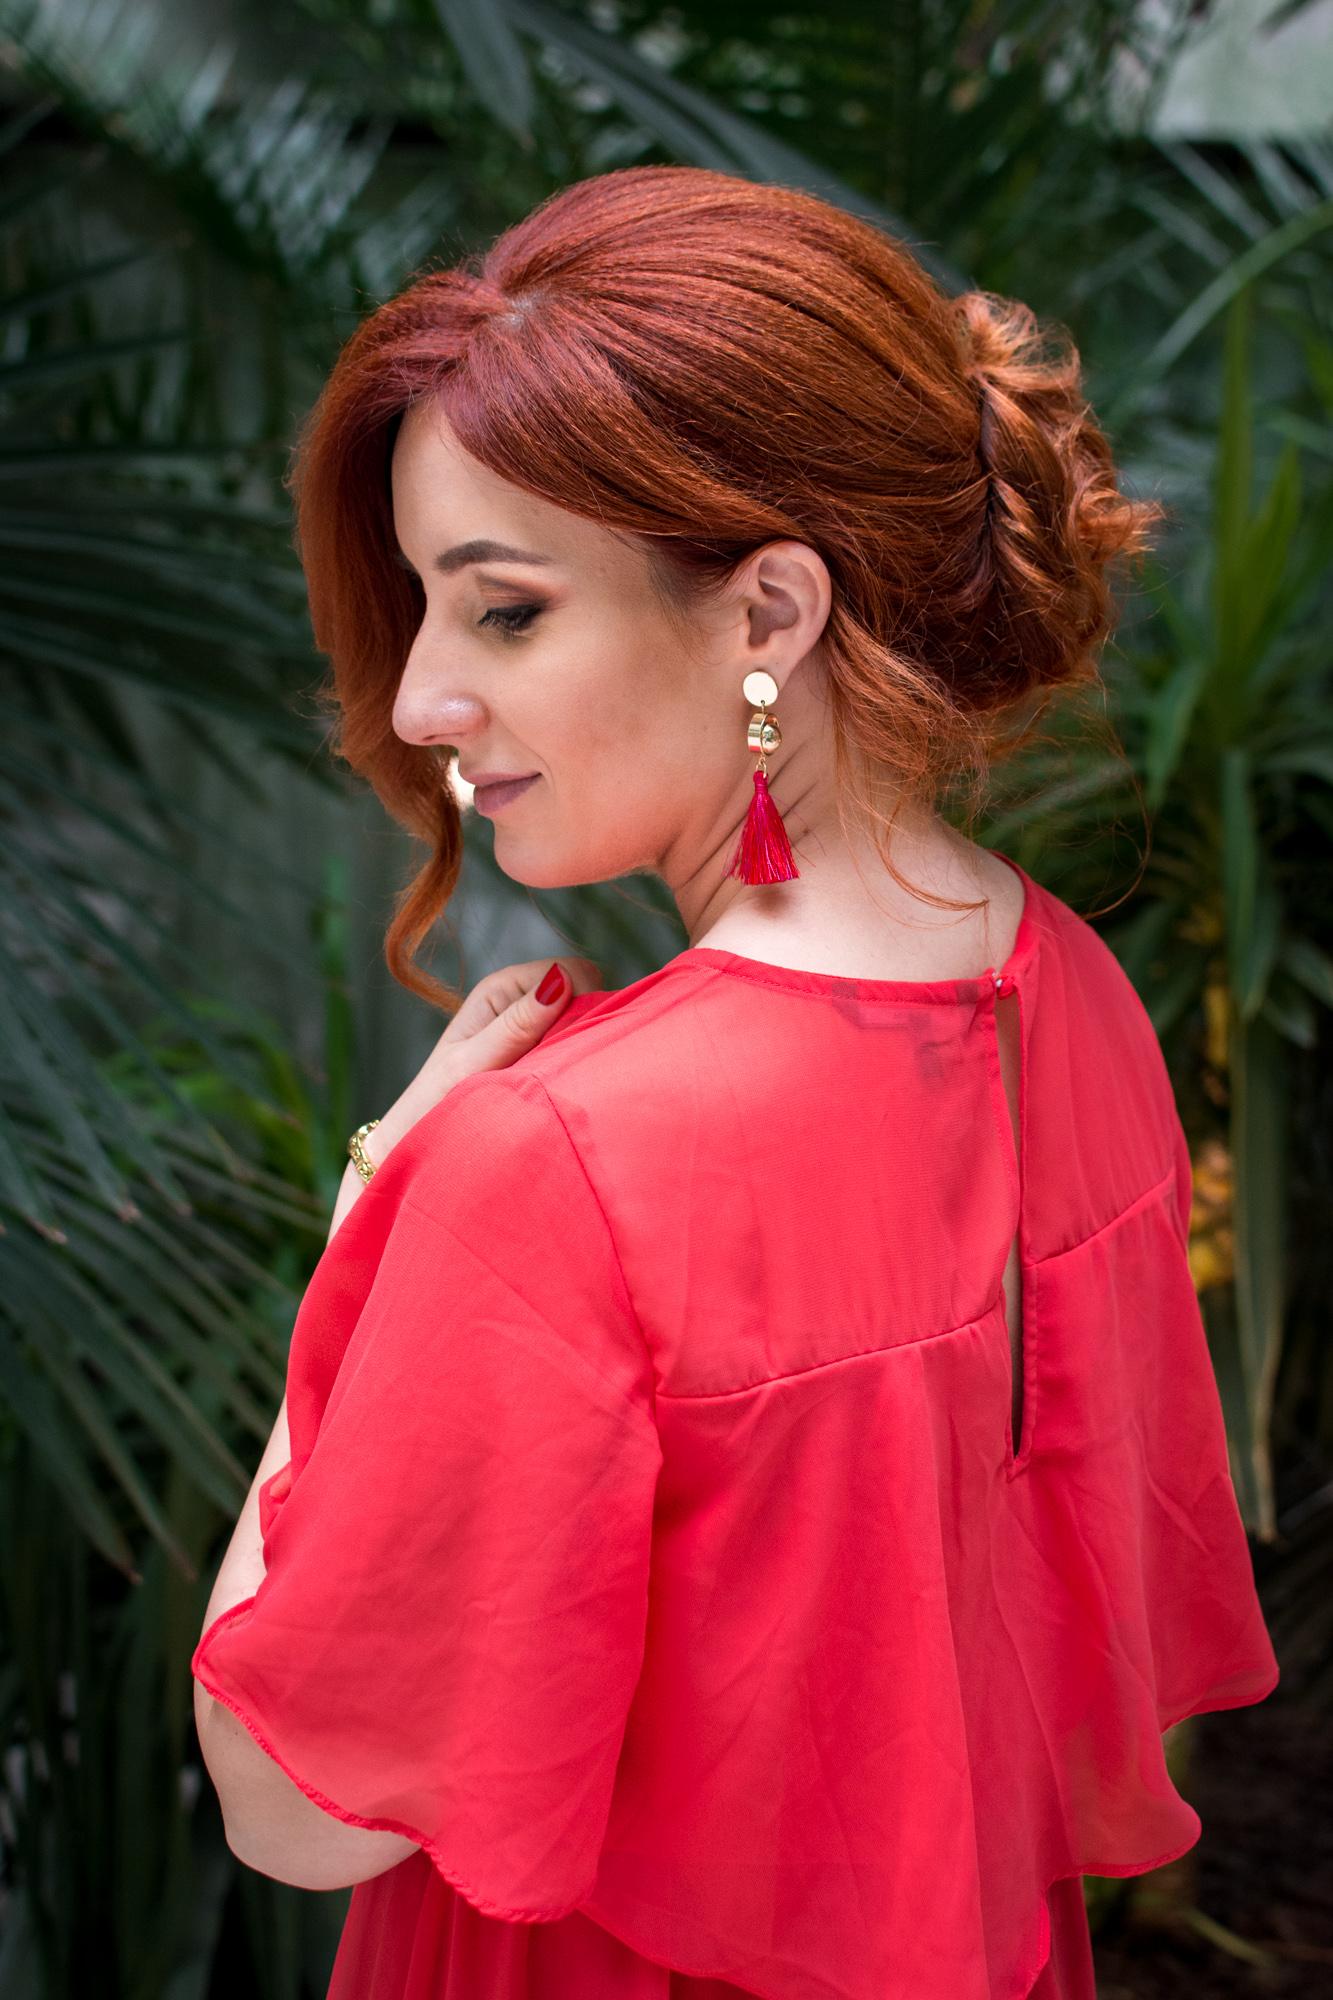 red dress-3